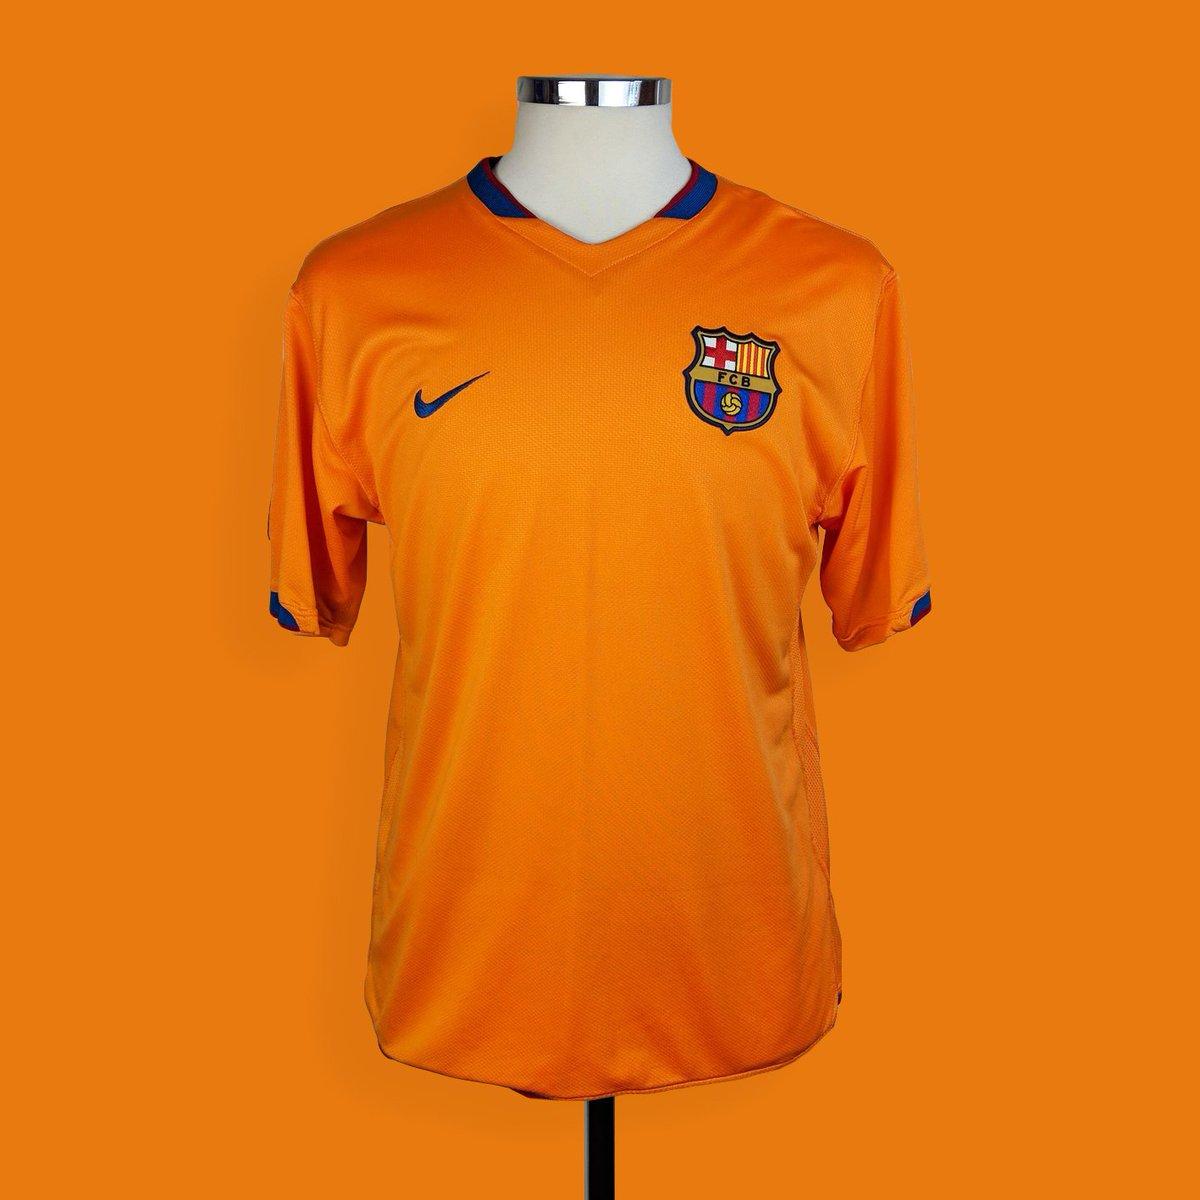 newest 77c16 1f468 Classic Football Shirts on Twitter: